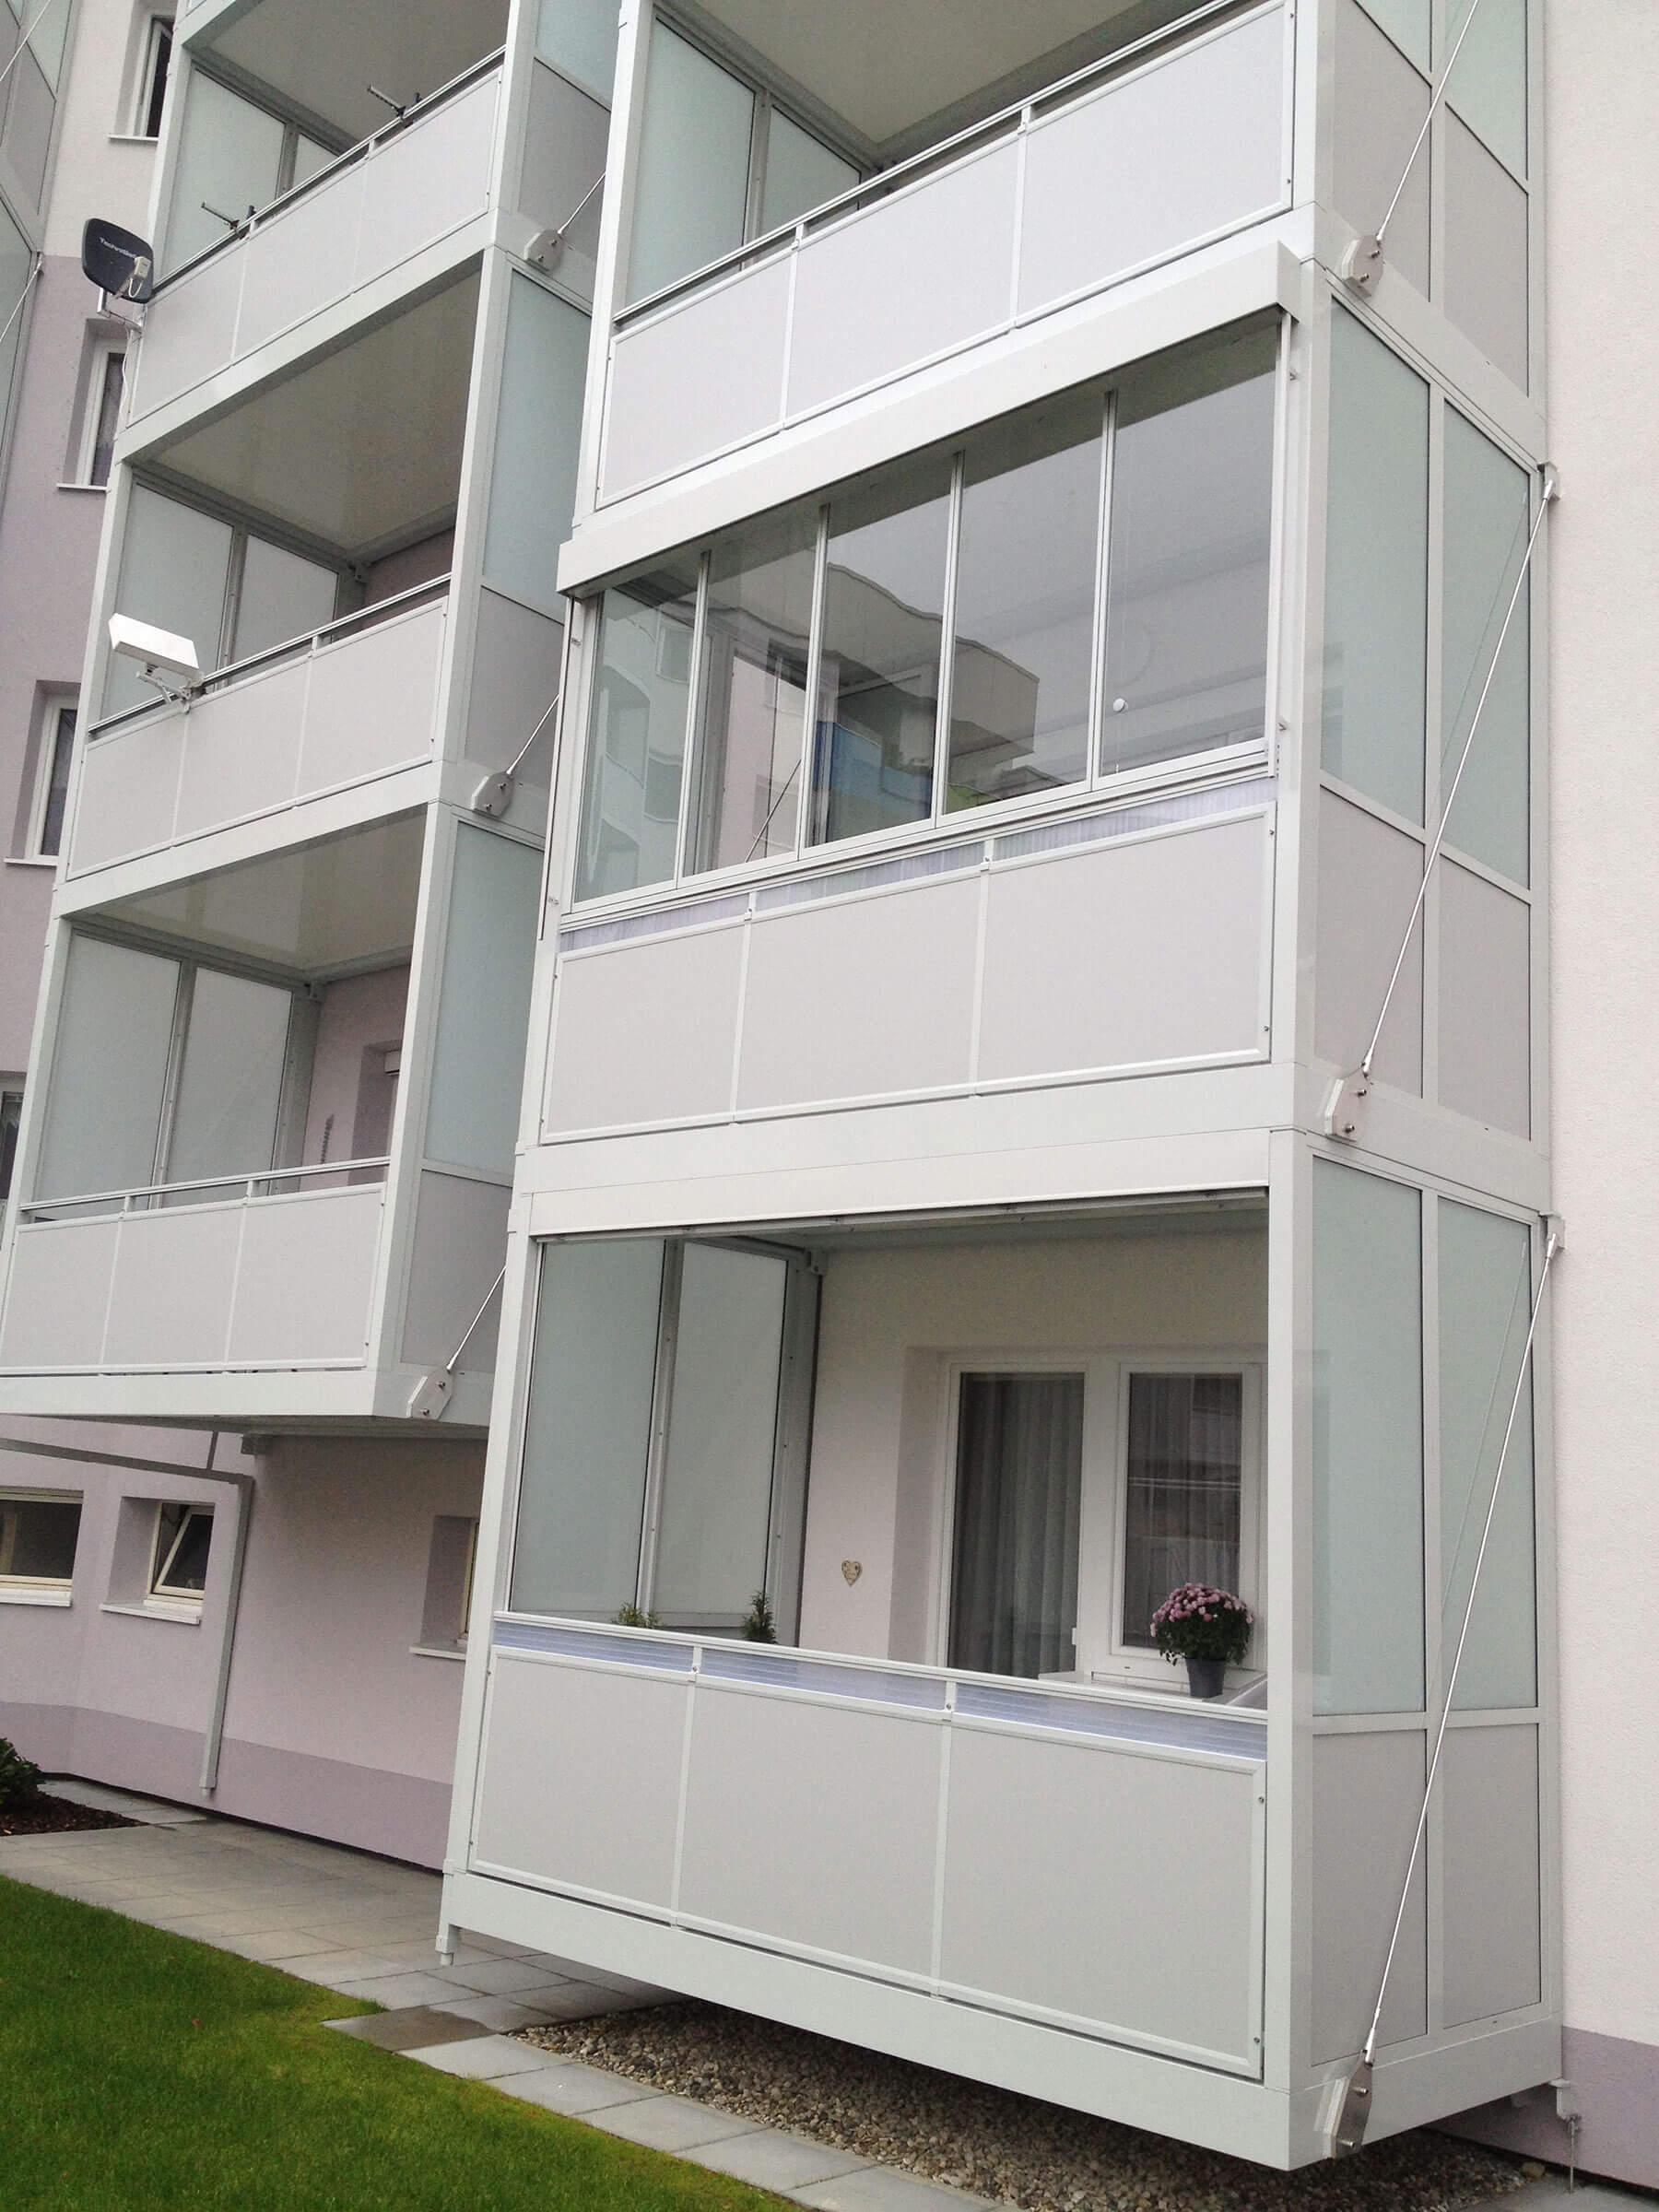 balkonverbauung mit sunflex faltelement sf 25 in alu natur eloxiert. Black Bedroom Furniture Sets. Home Design Ideas